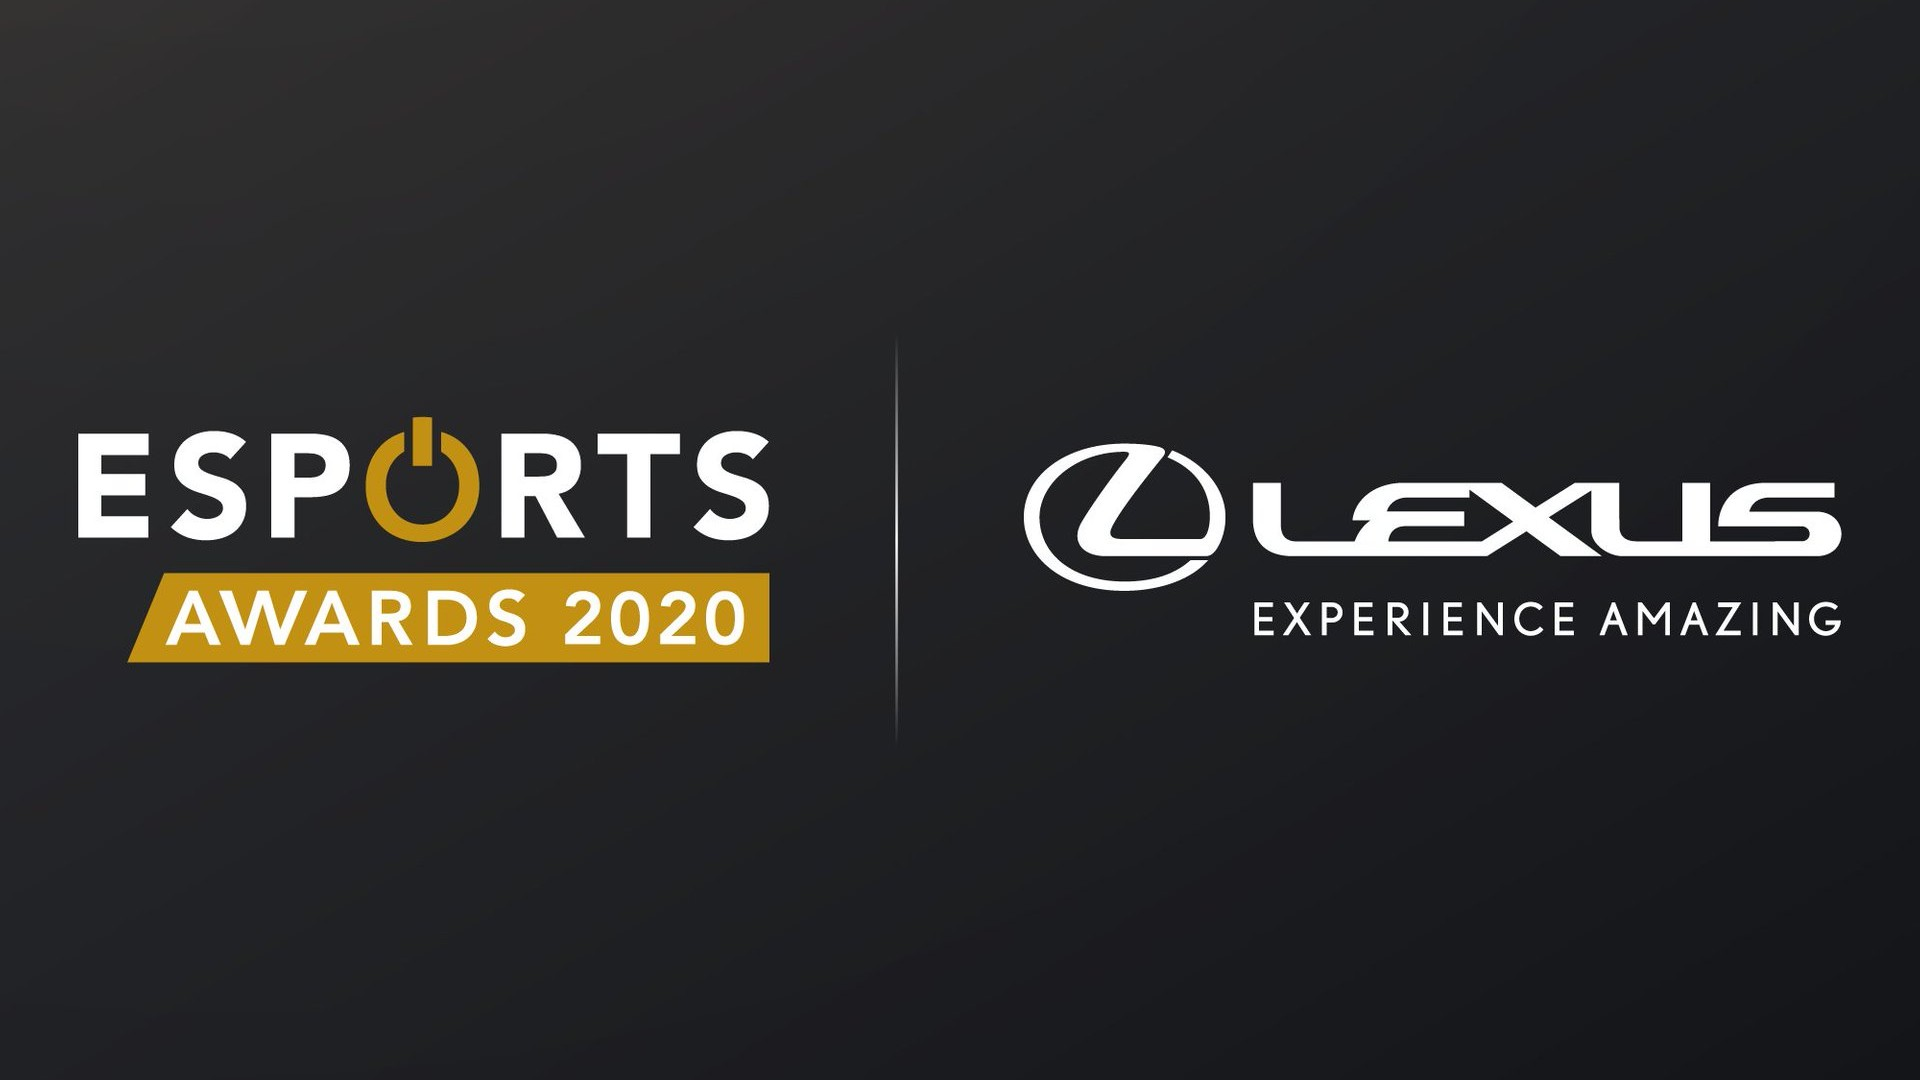 Lexus x Esports Awards 2020